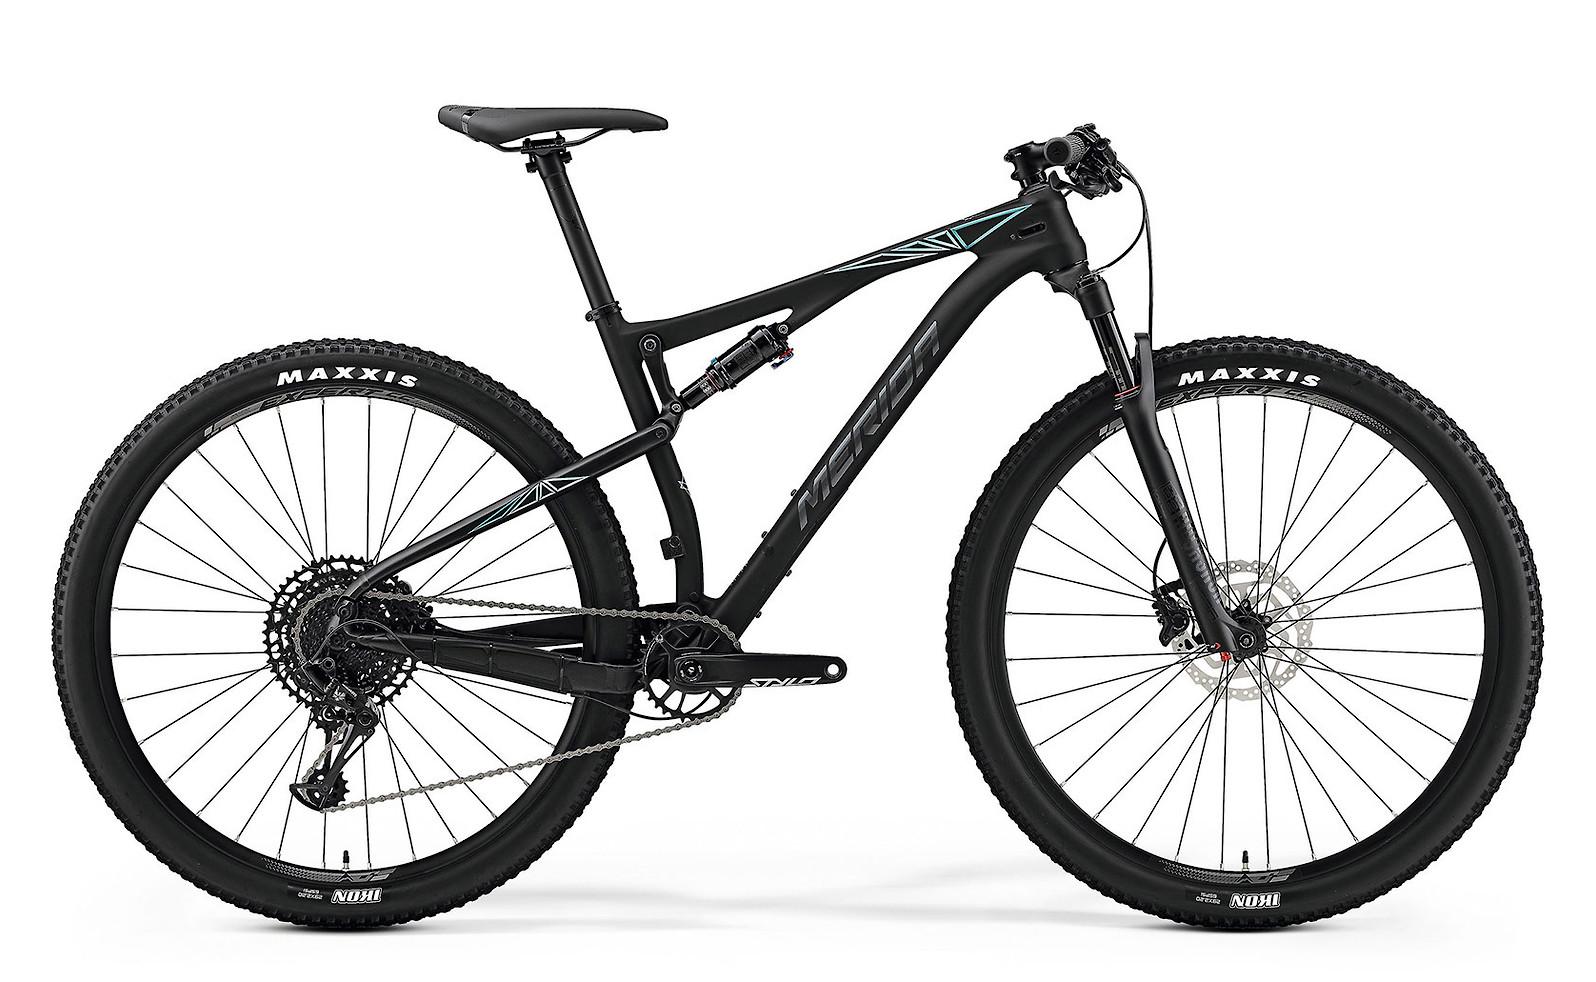 2019 Merida Ninety-Six 4000 Bike